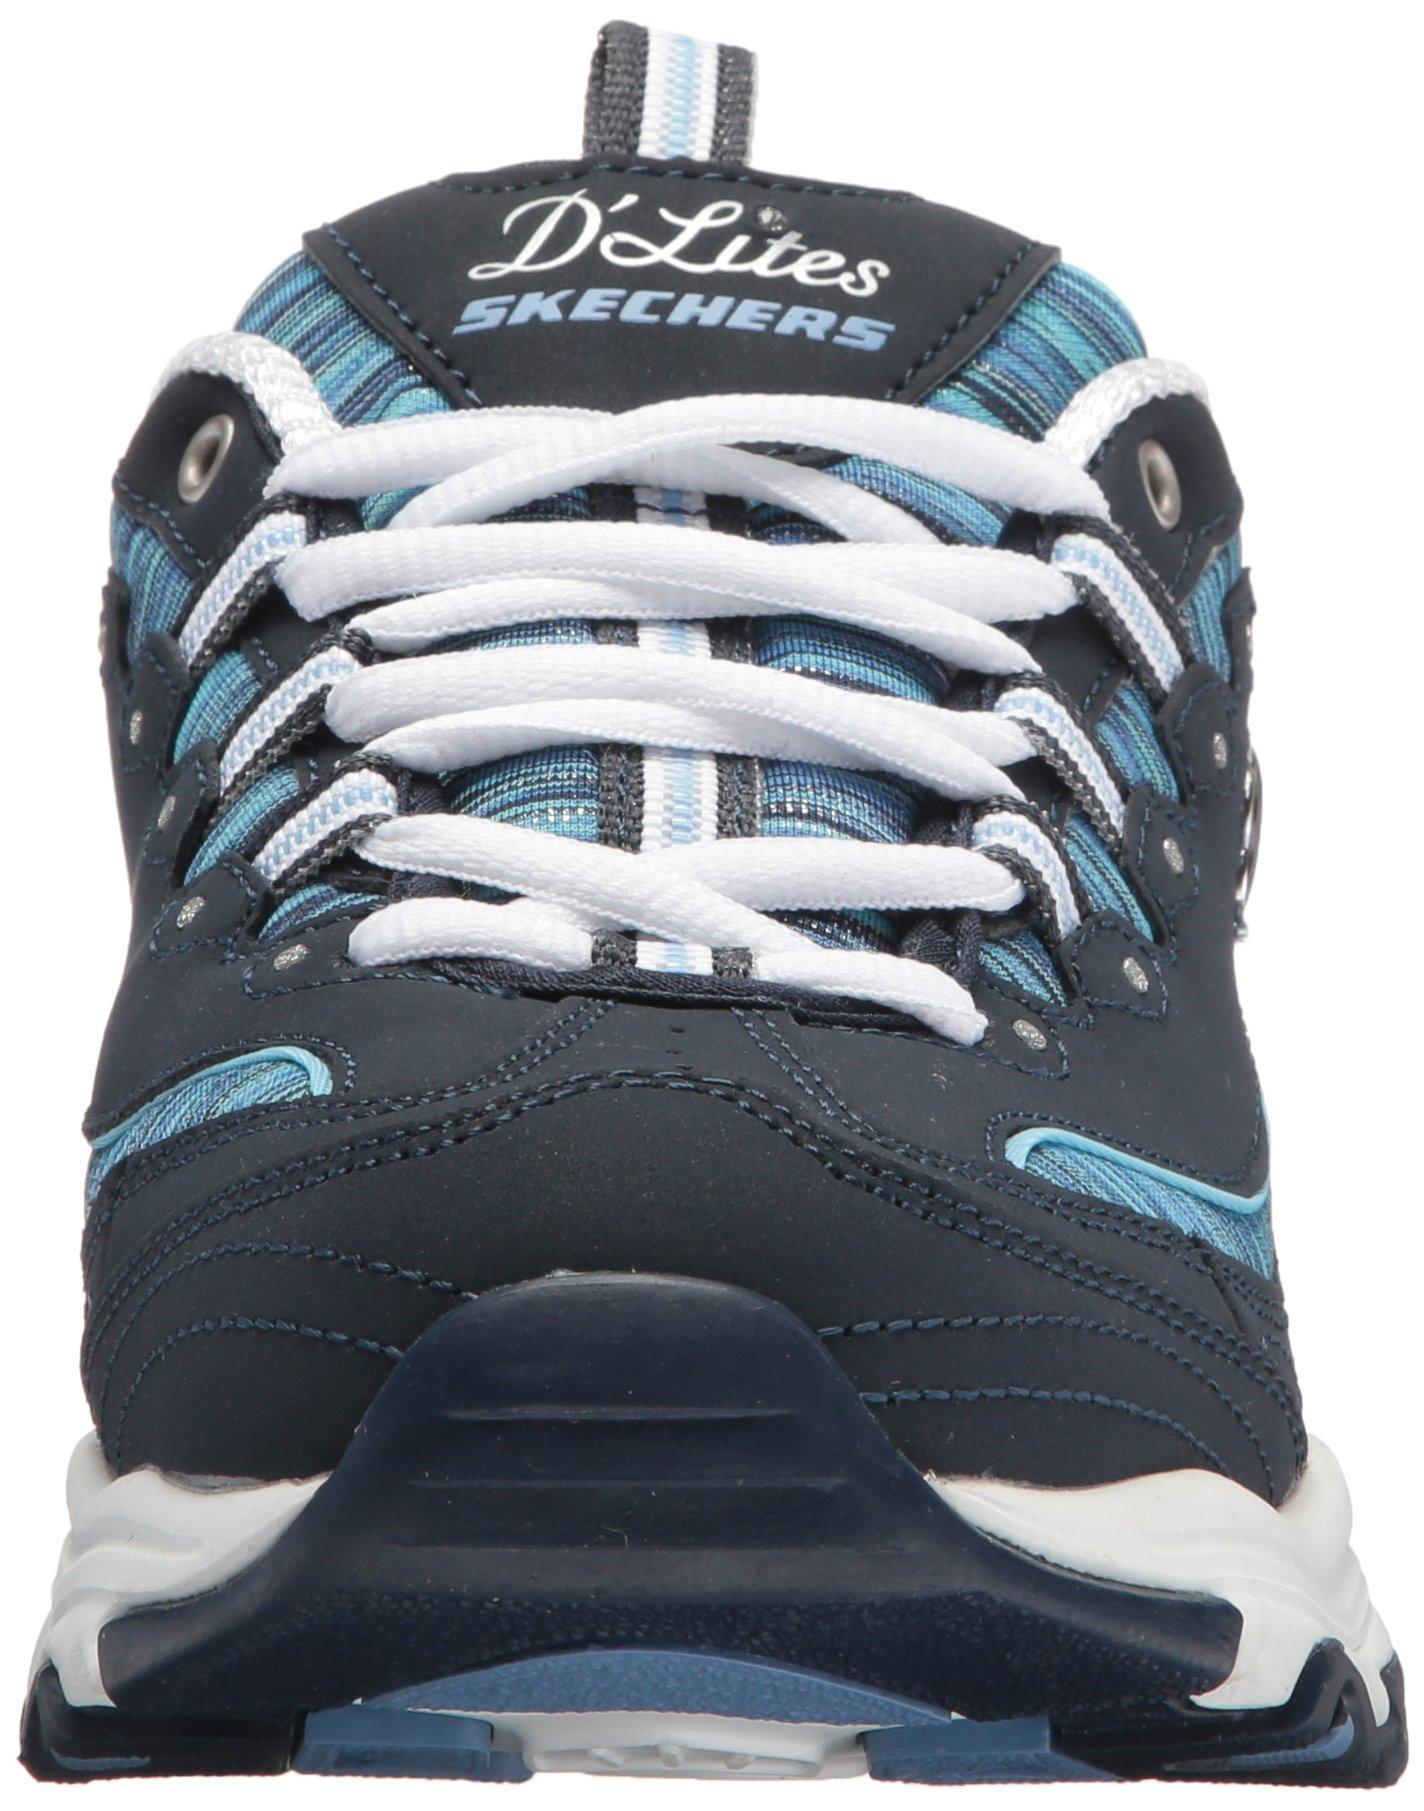 5550b65d8ae4 Skechers Sport Women s Dlites Interlude Sneaker